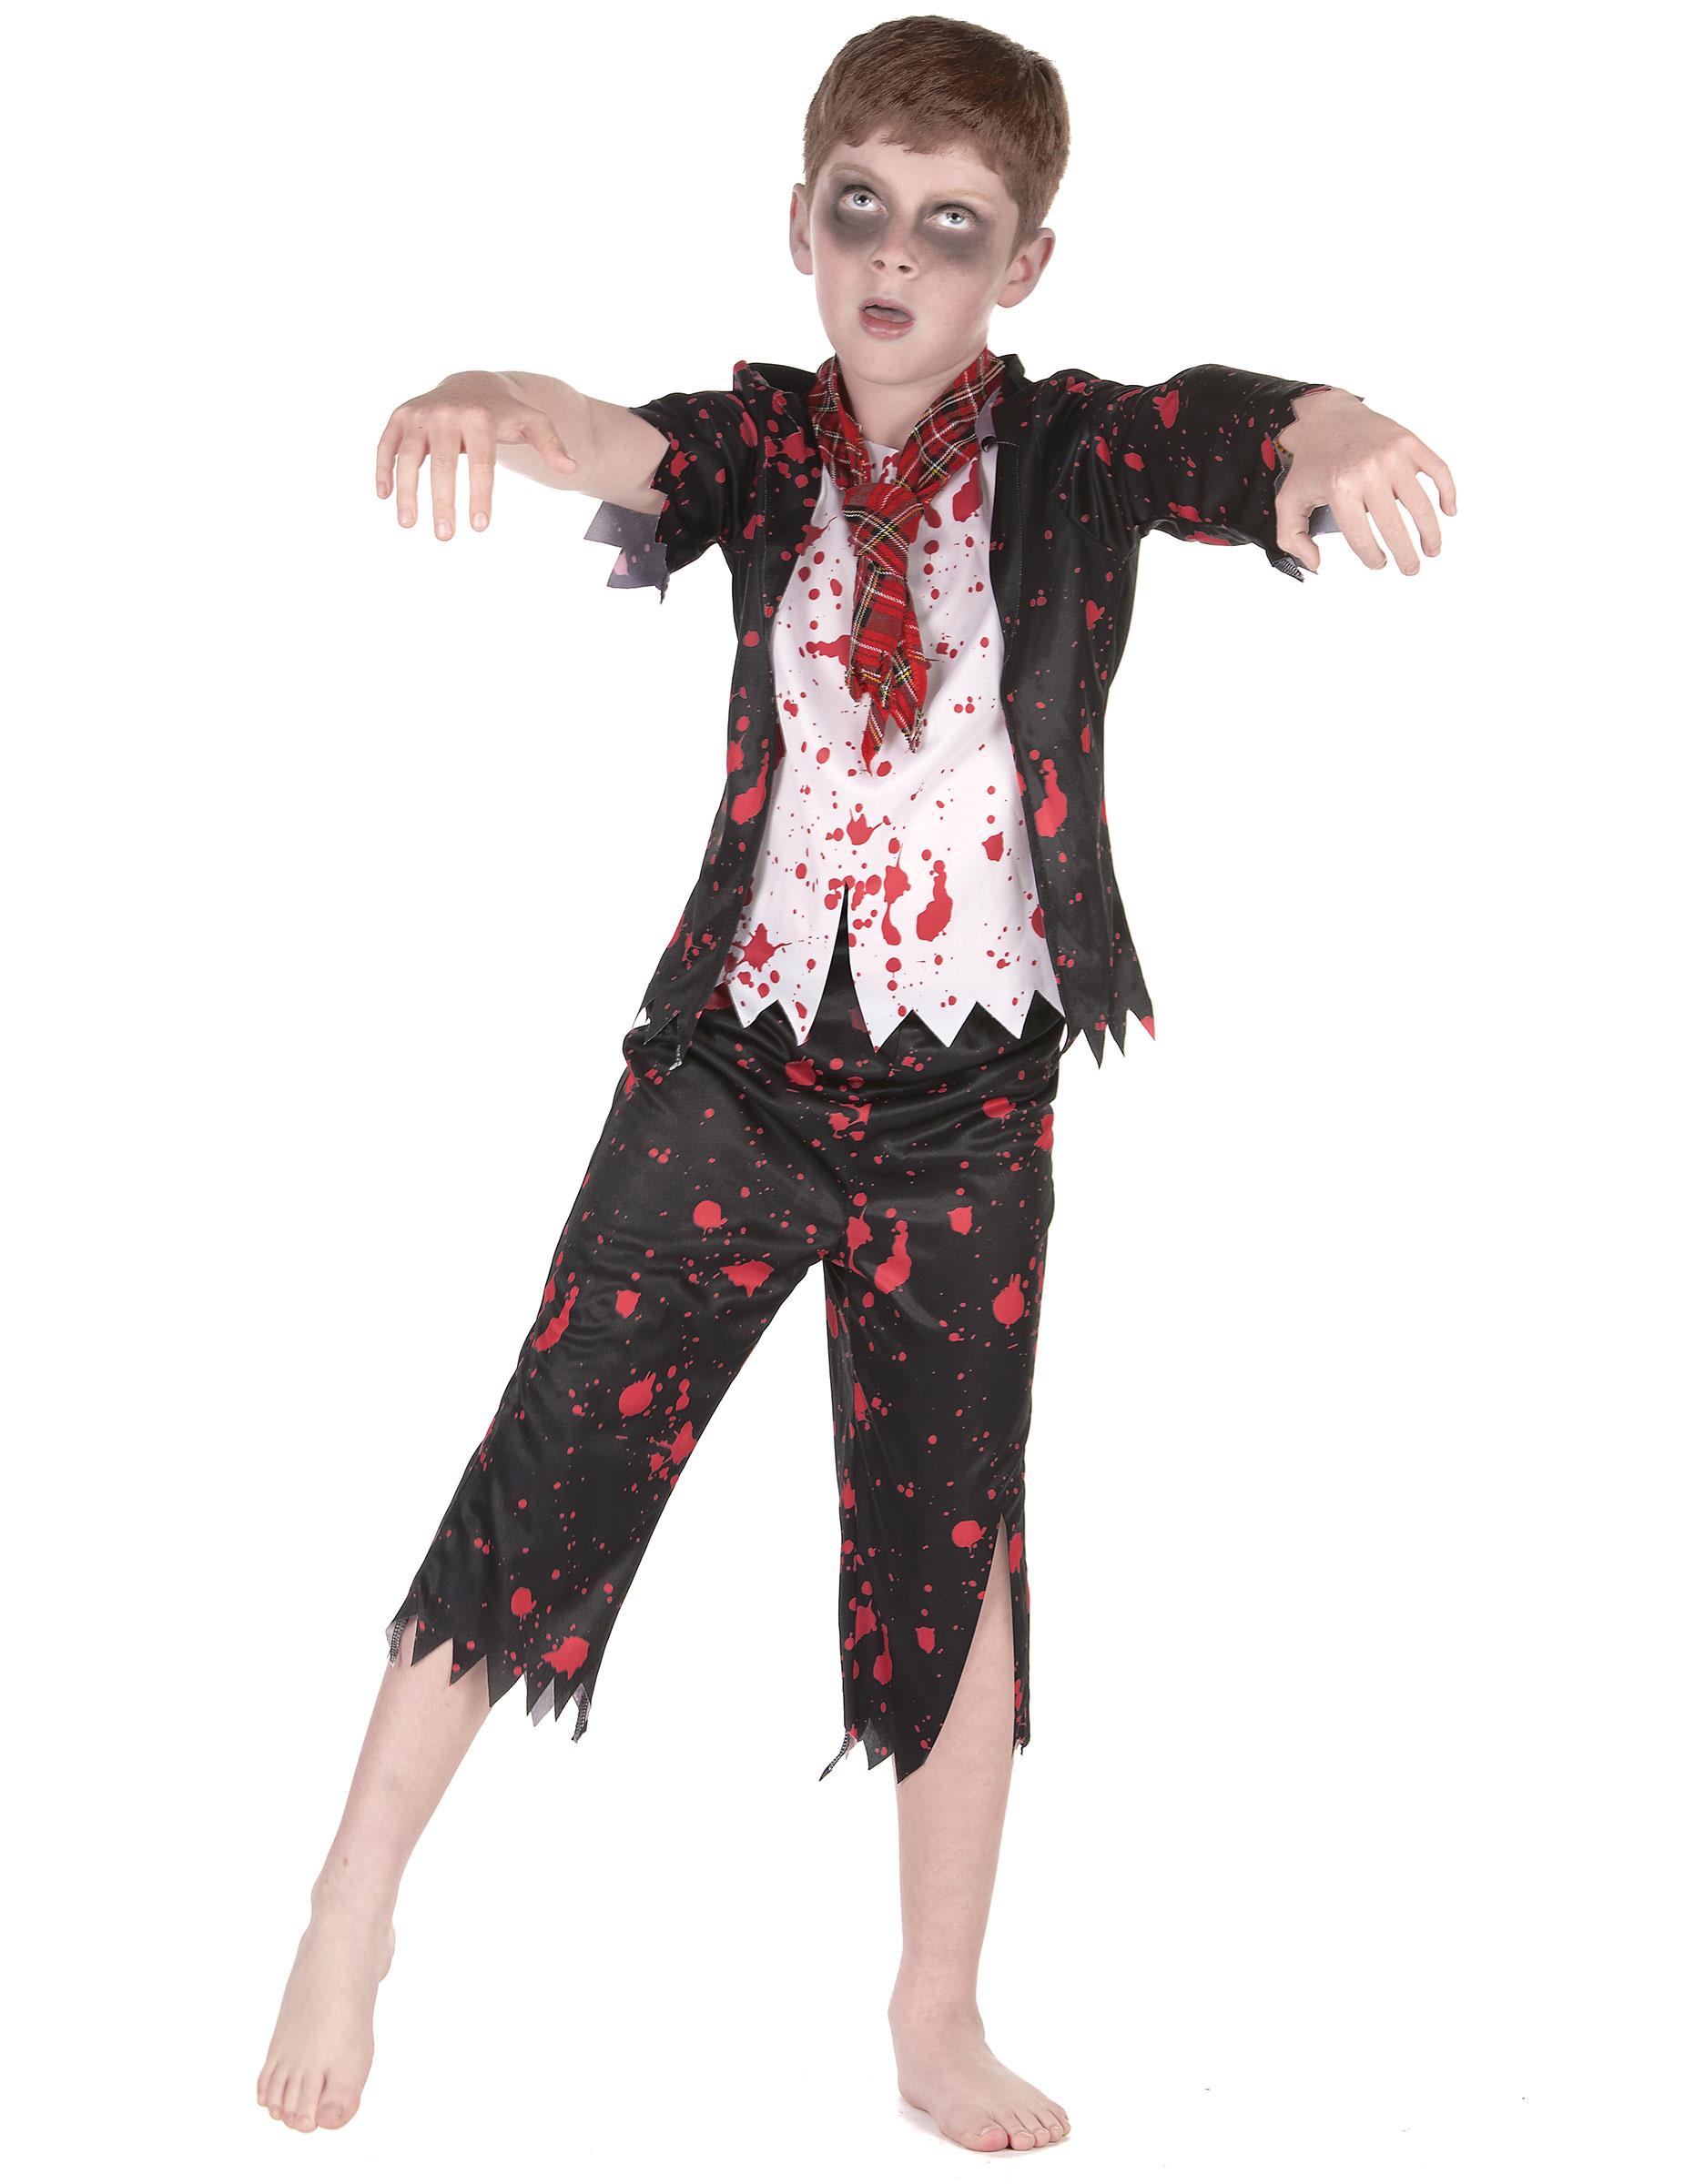 Zombie Schuler Kostum Fur Jungen Halloween Kostum Schwarz Weiss